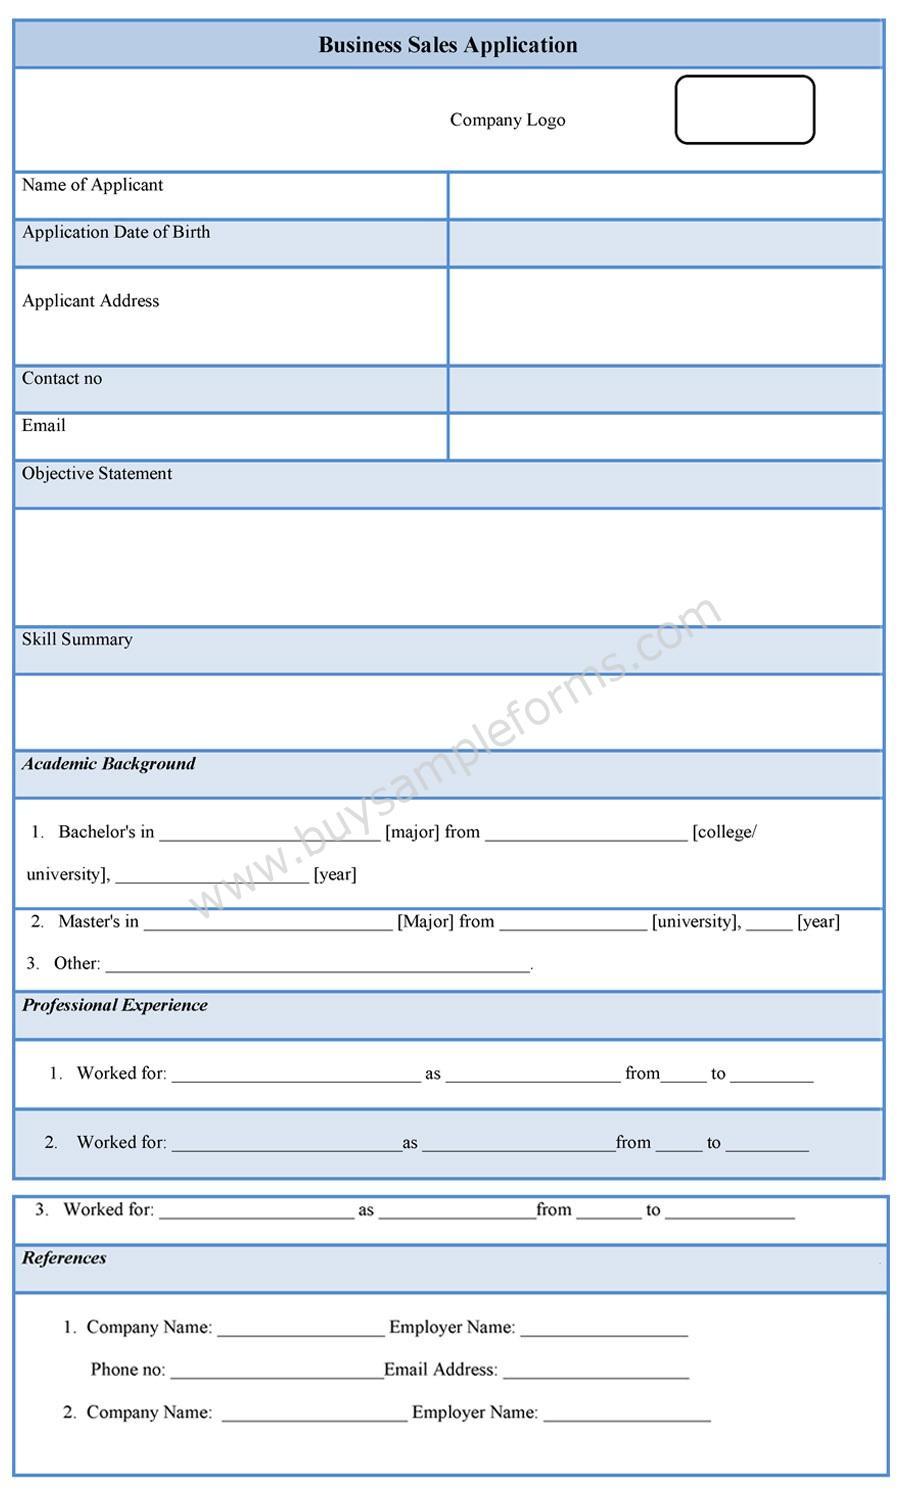 Business Sale Application Form